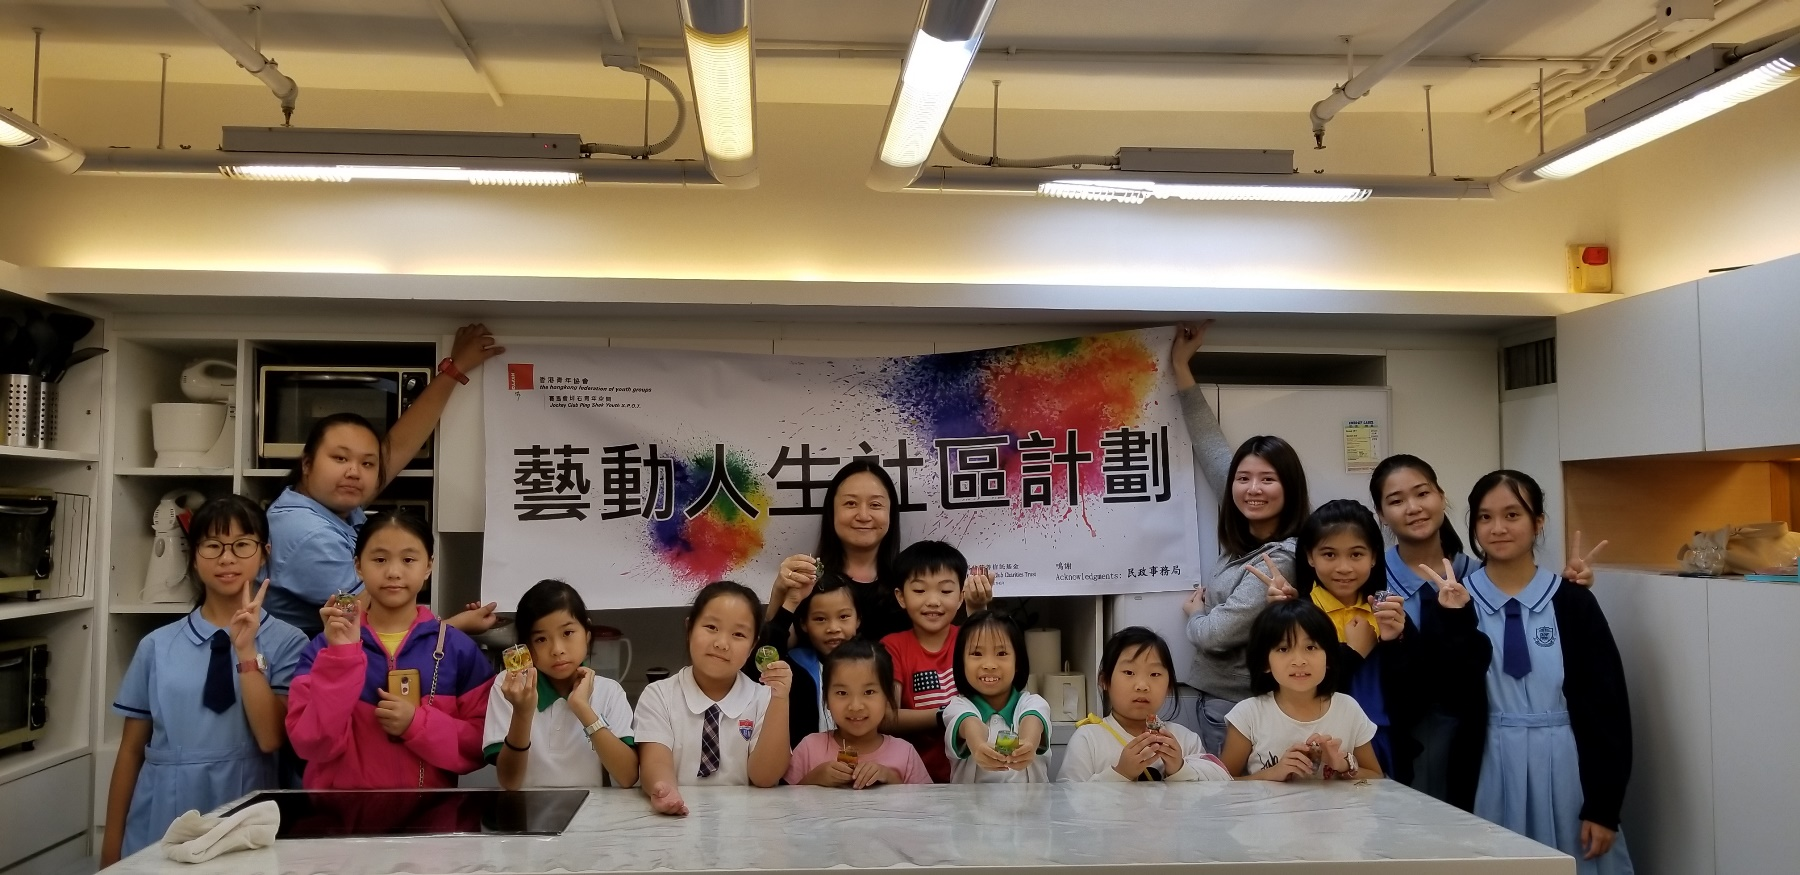 http://npc.edu.hk/sites/default/files/20181109_185915.jpg